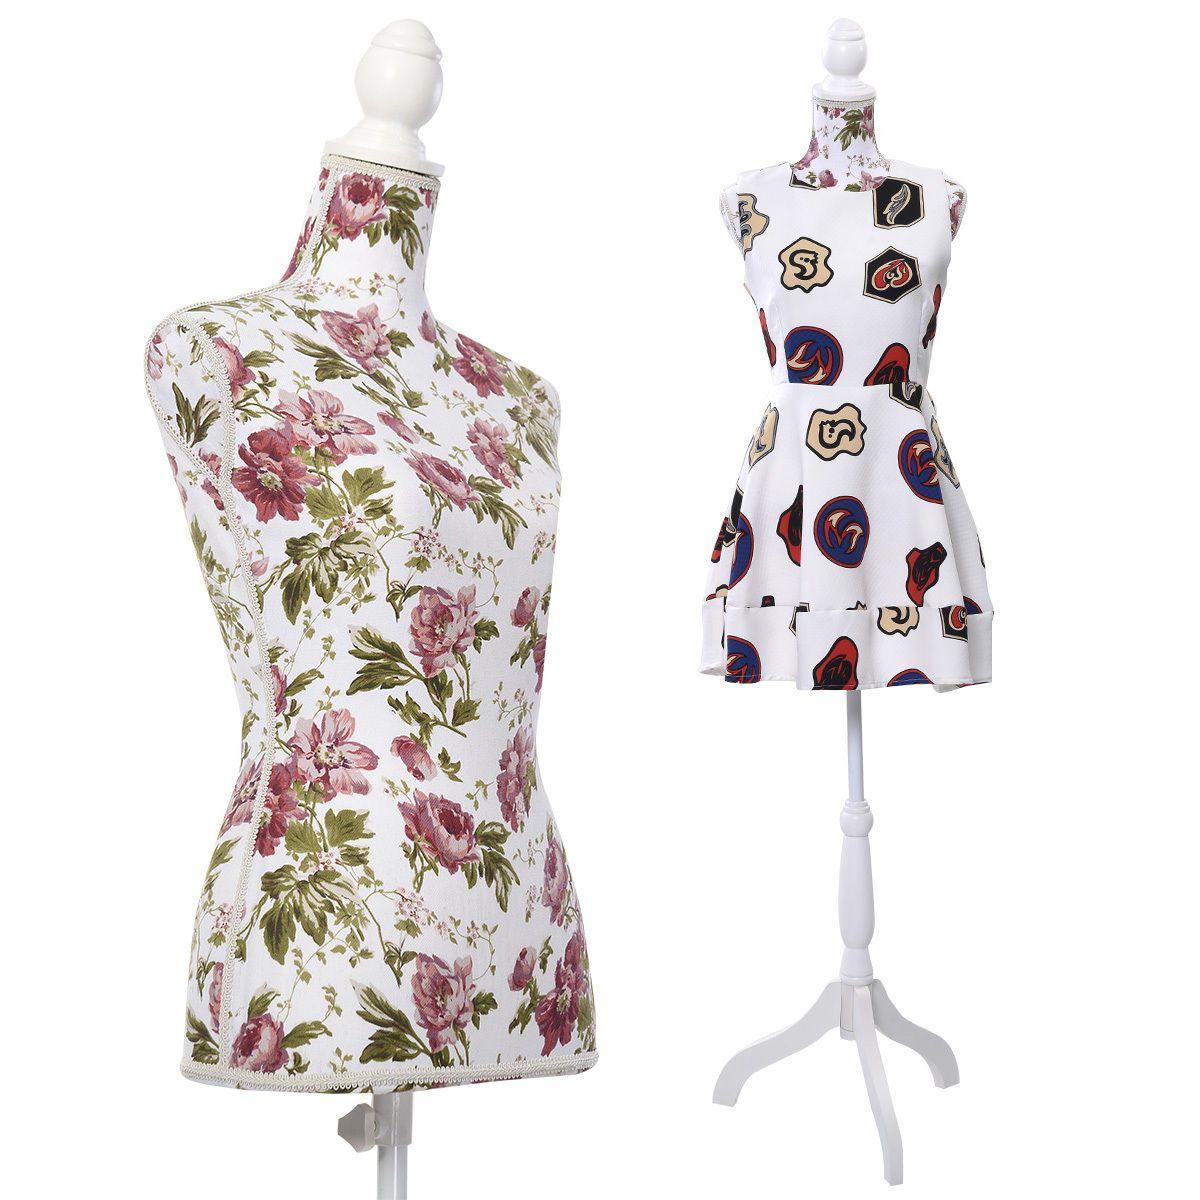 Goplus female mannequin torso dress form display w white